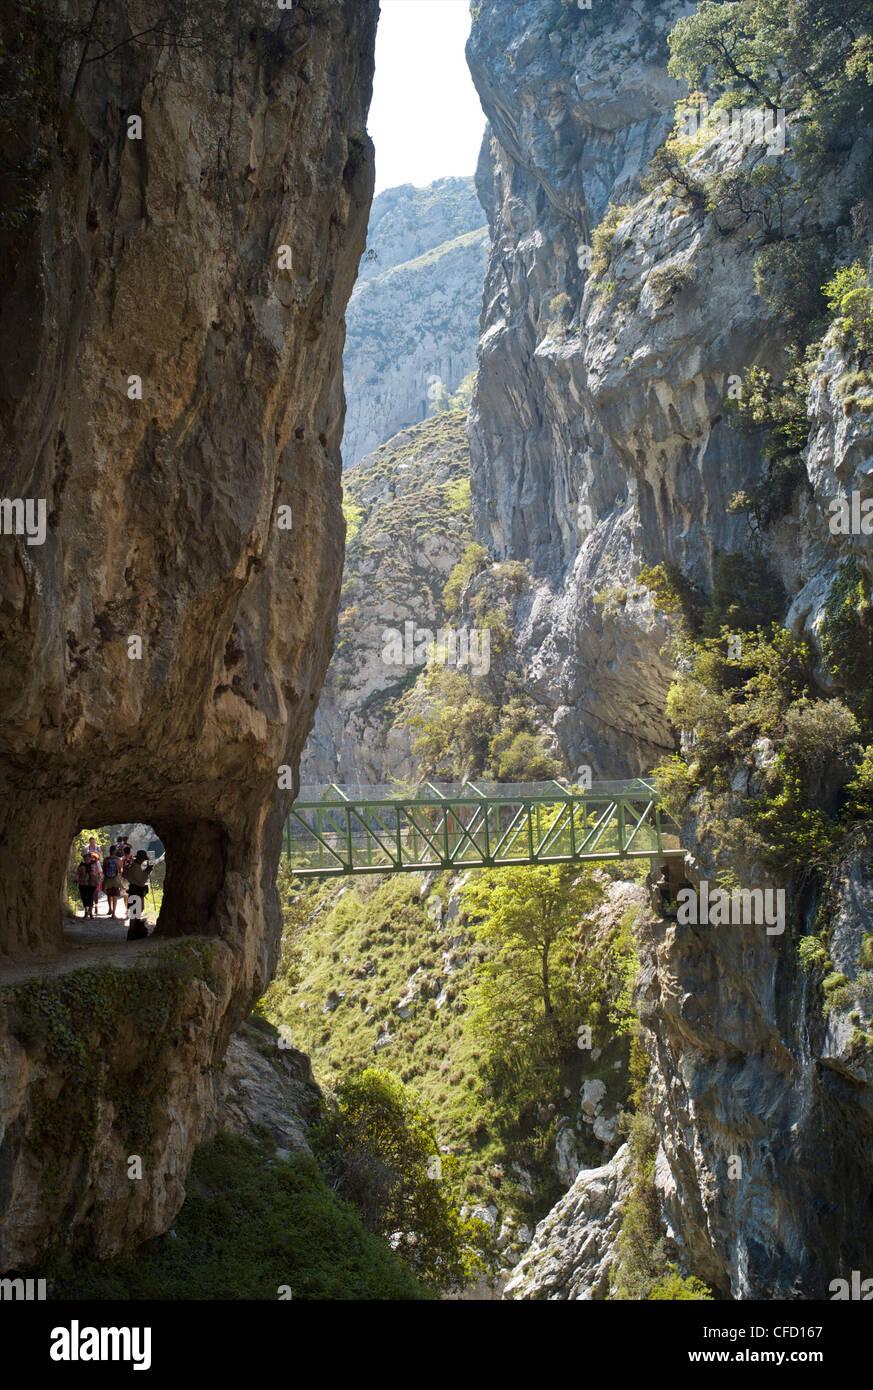 Footbridge over the Cares Gorge, Picos de Europa, Castilla y Leon, Spain, Europe - Stock Image